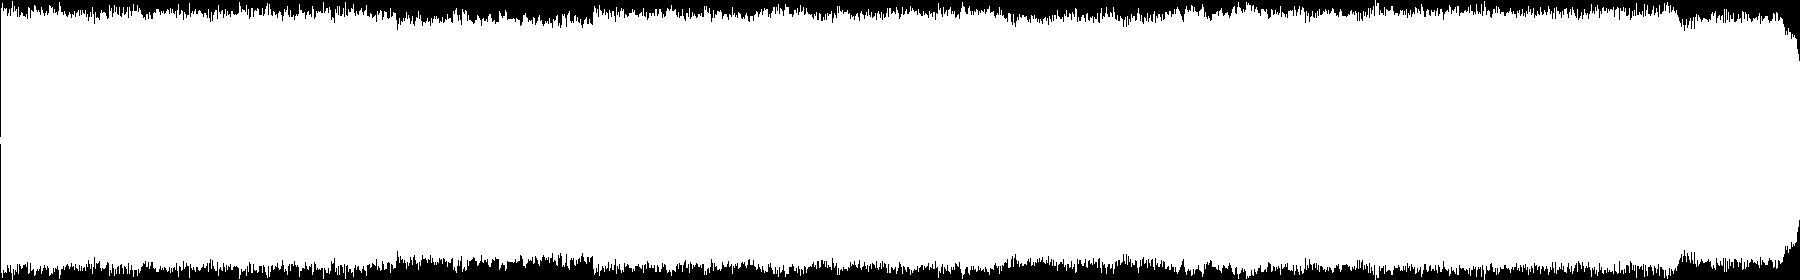 Vapor audio waveform